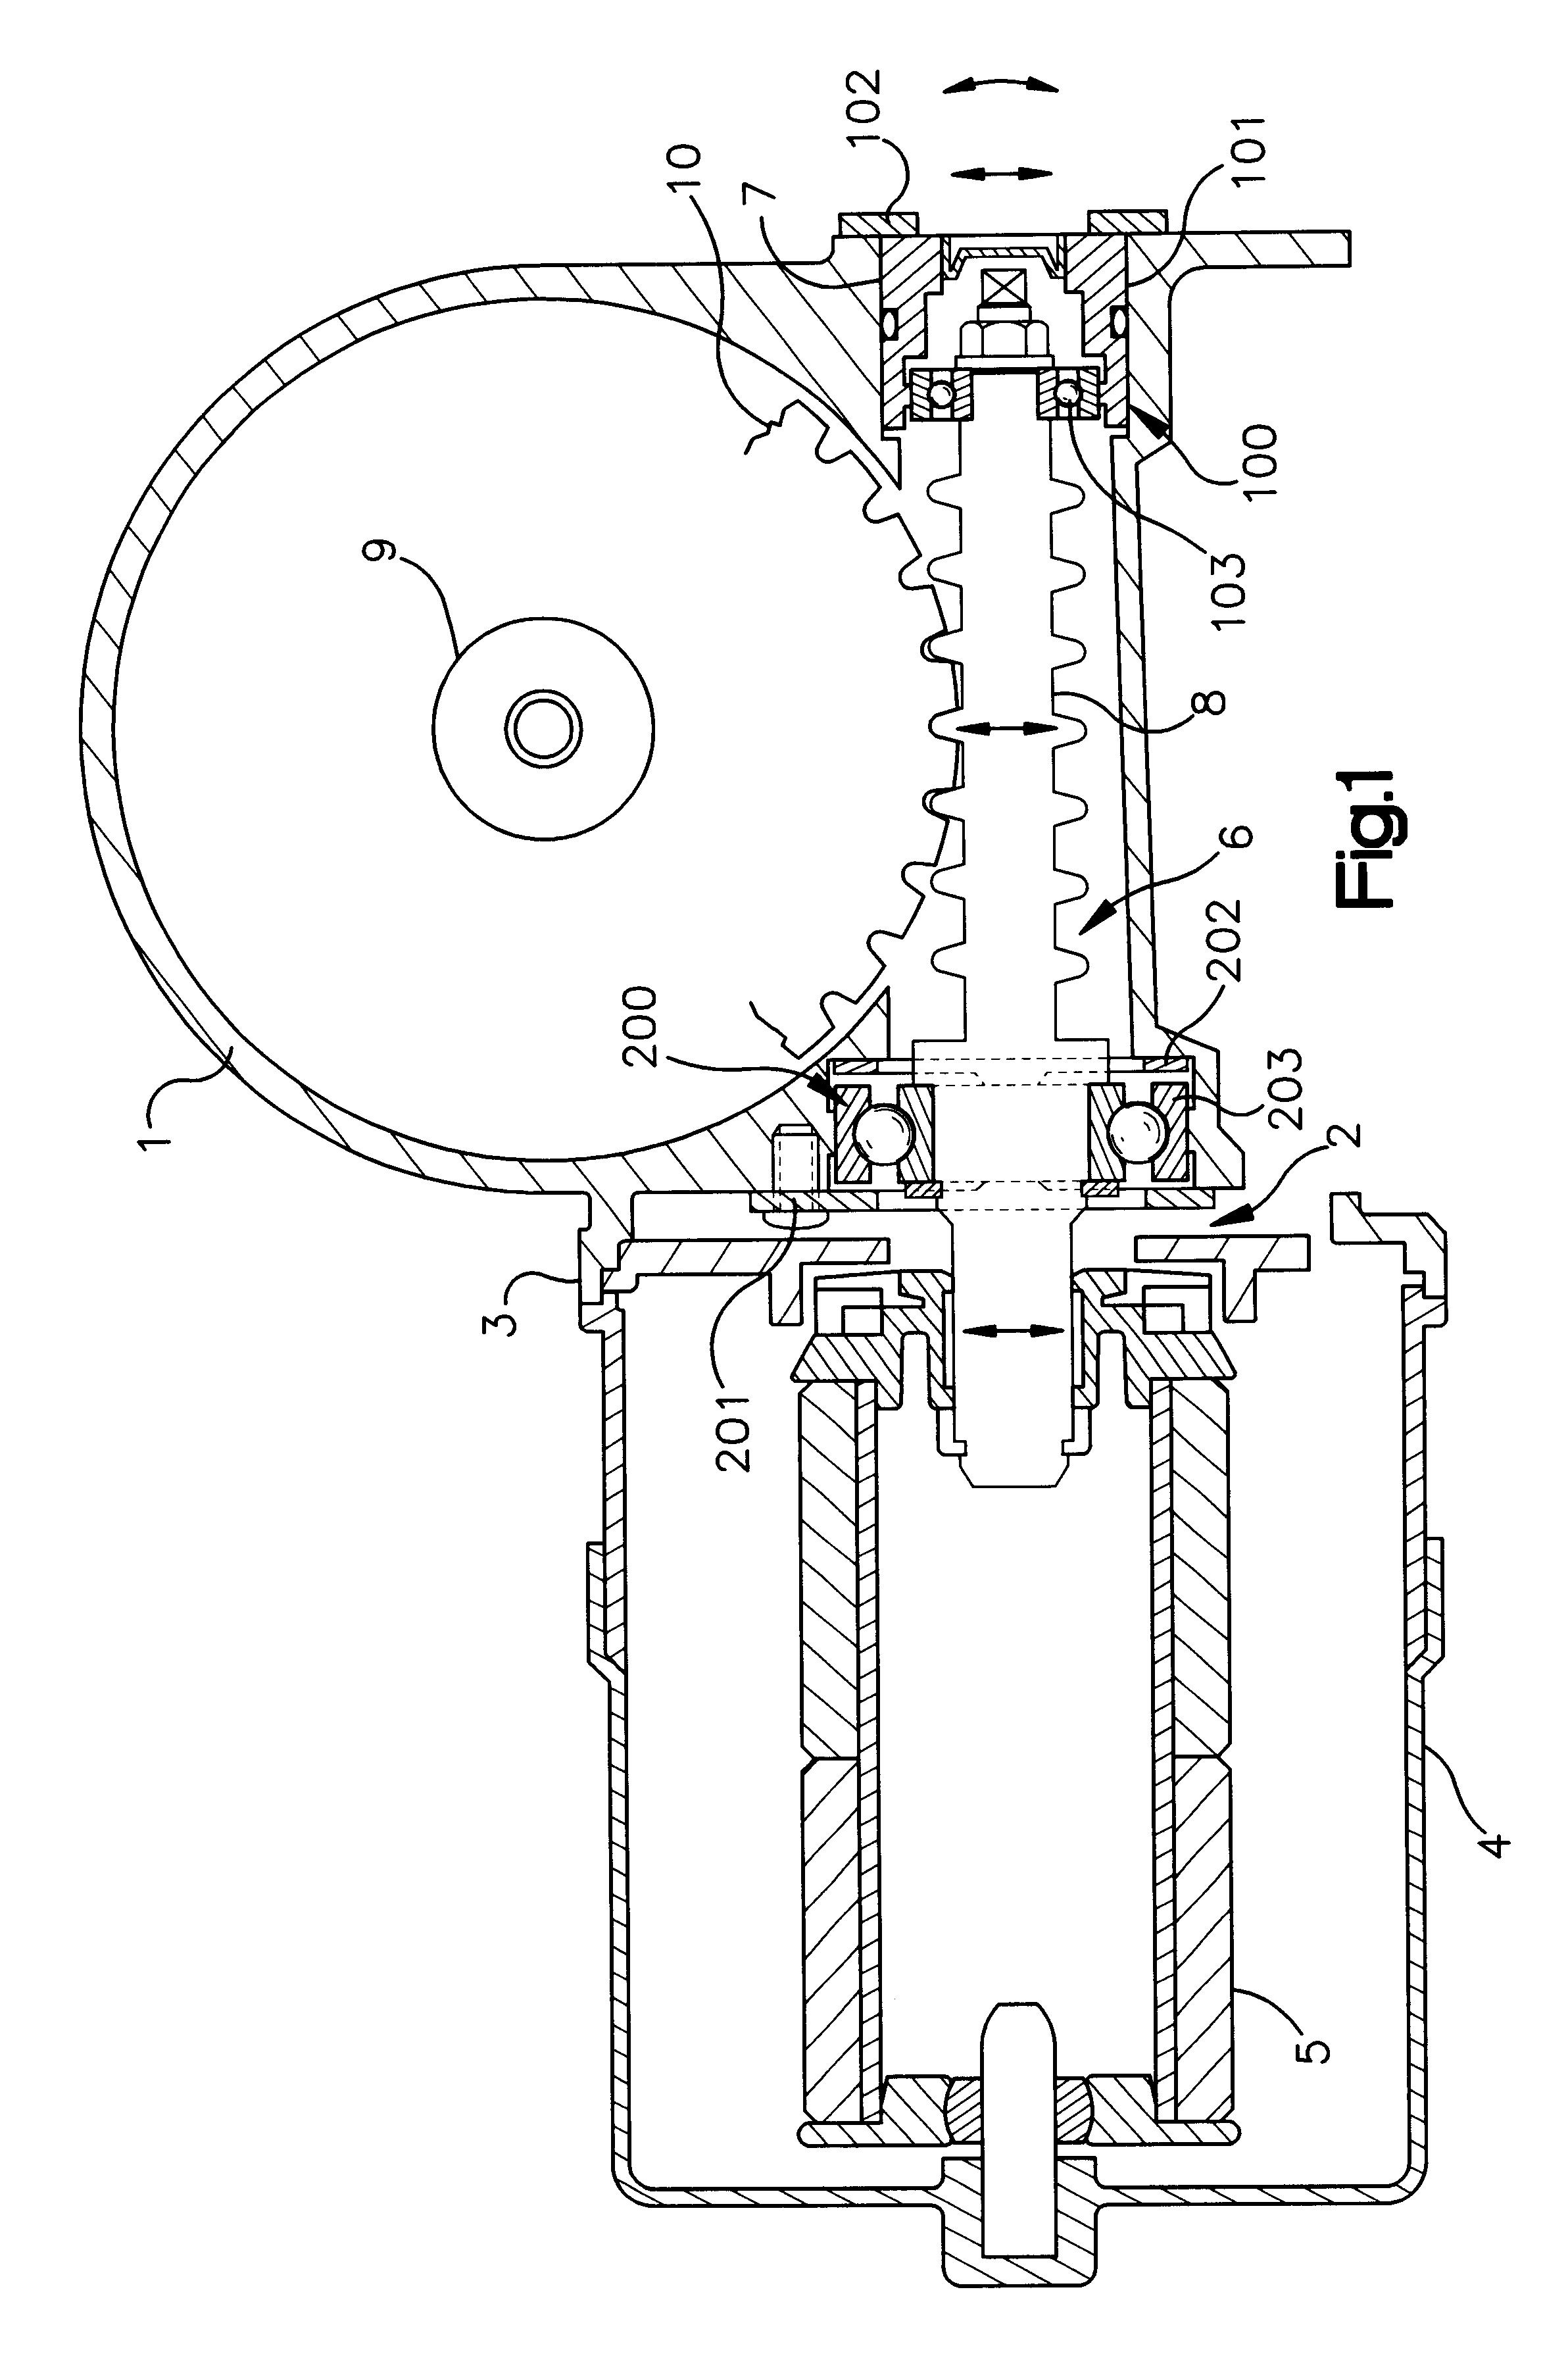 6 Volt Dual Shaft Motor